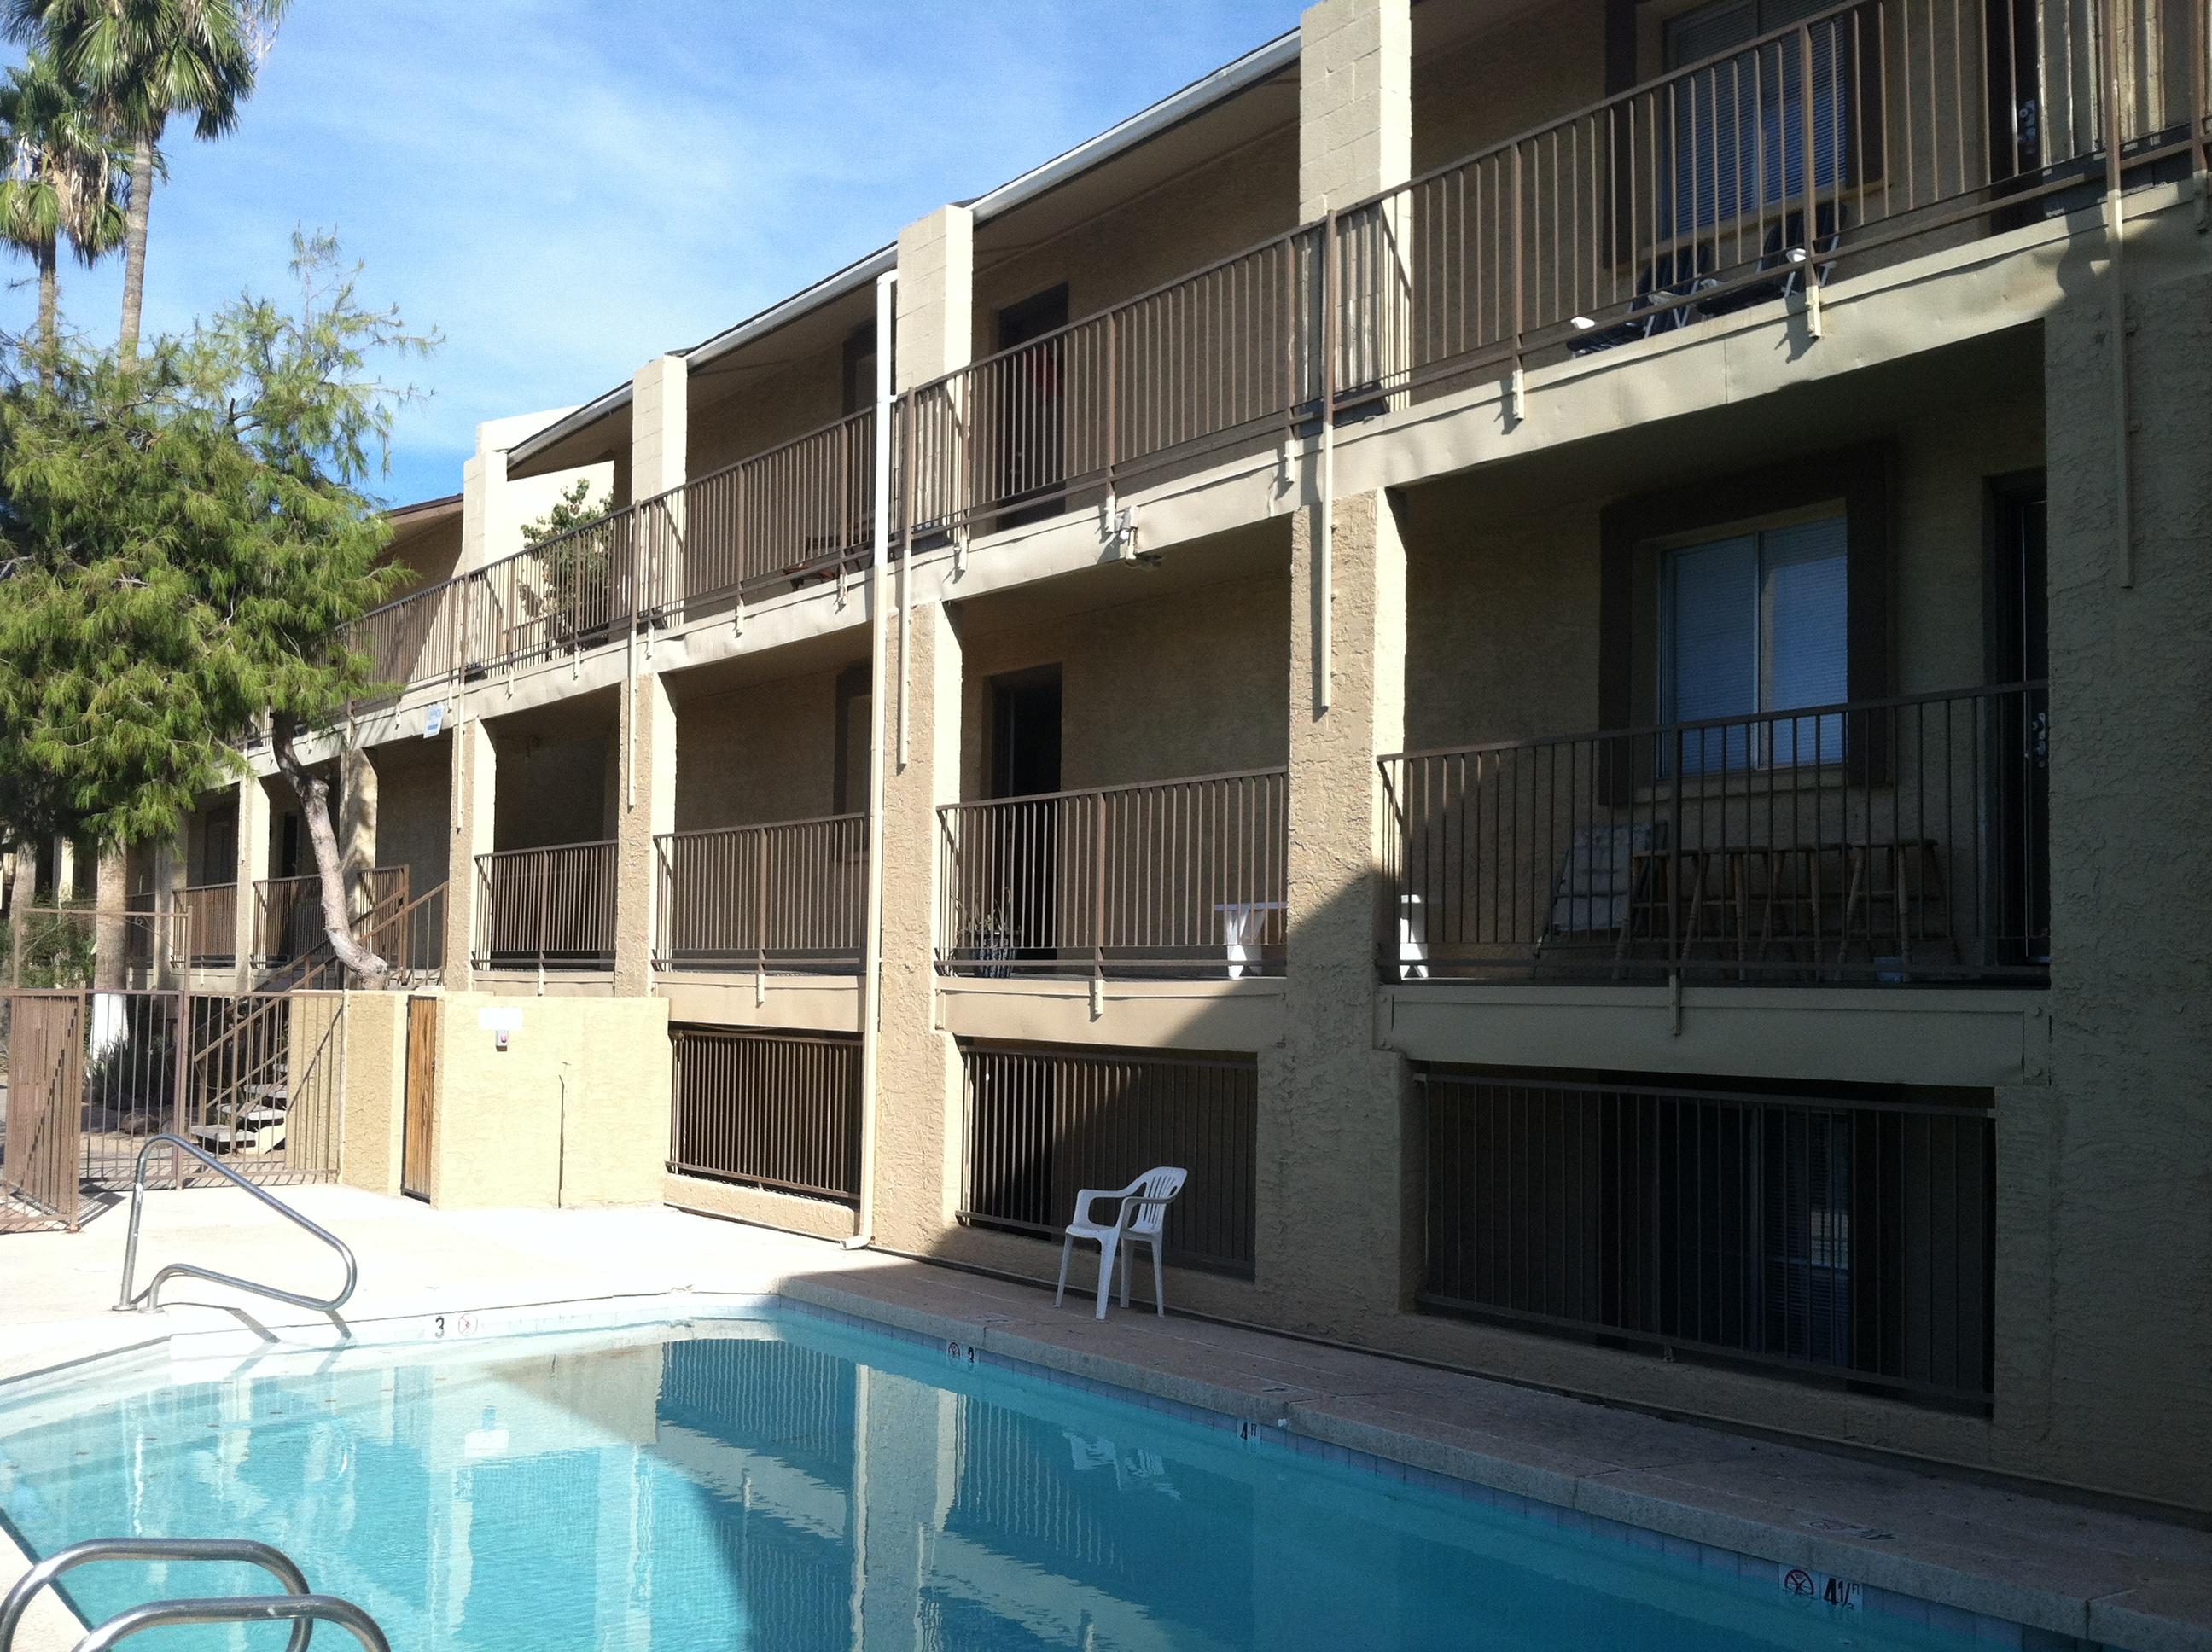 Grandview Terrace Apartments